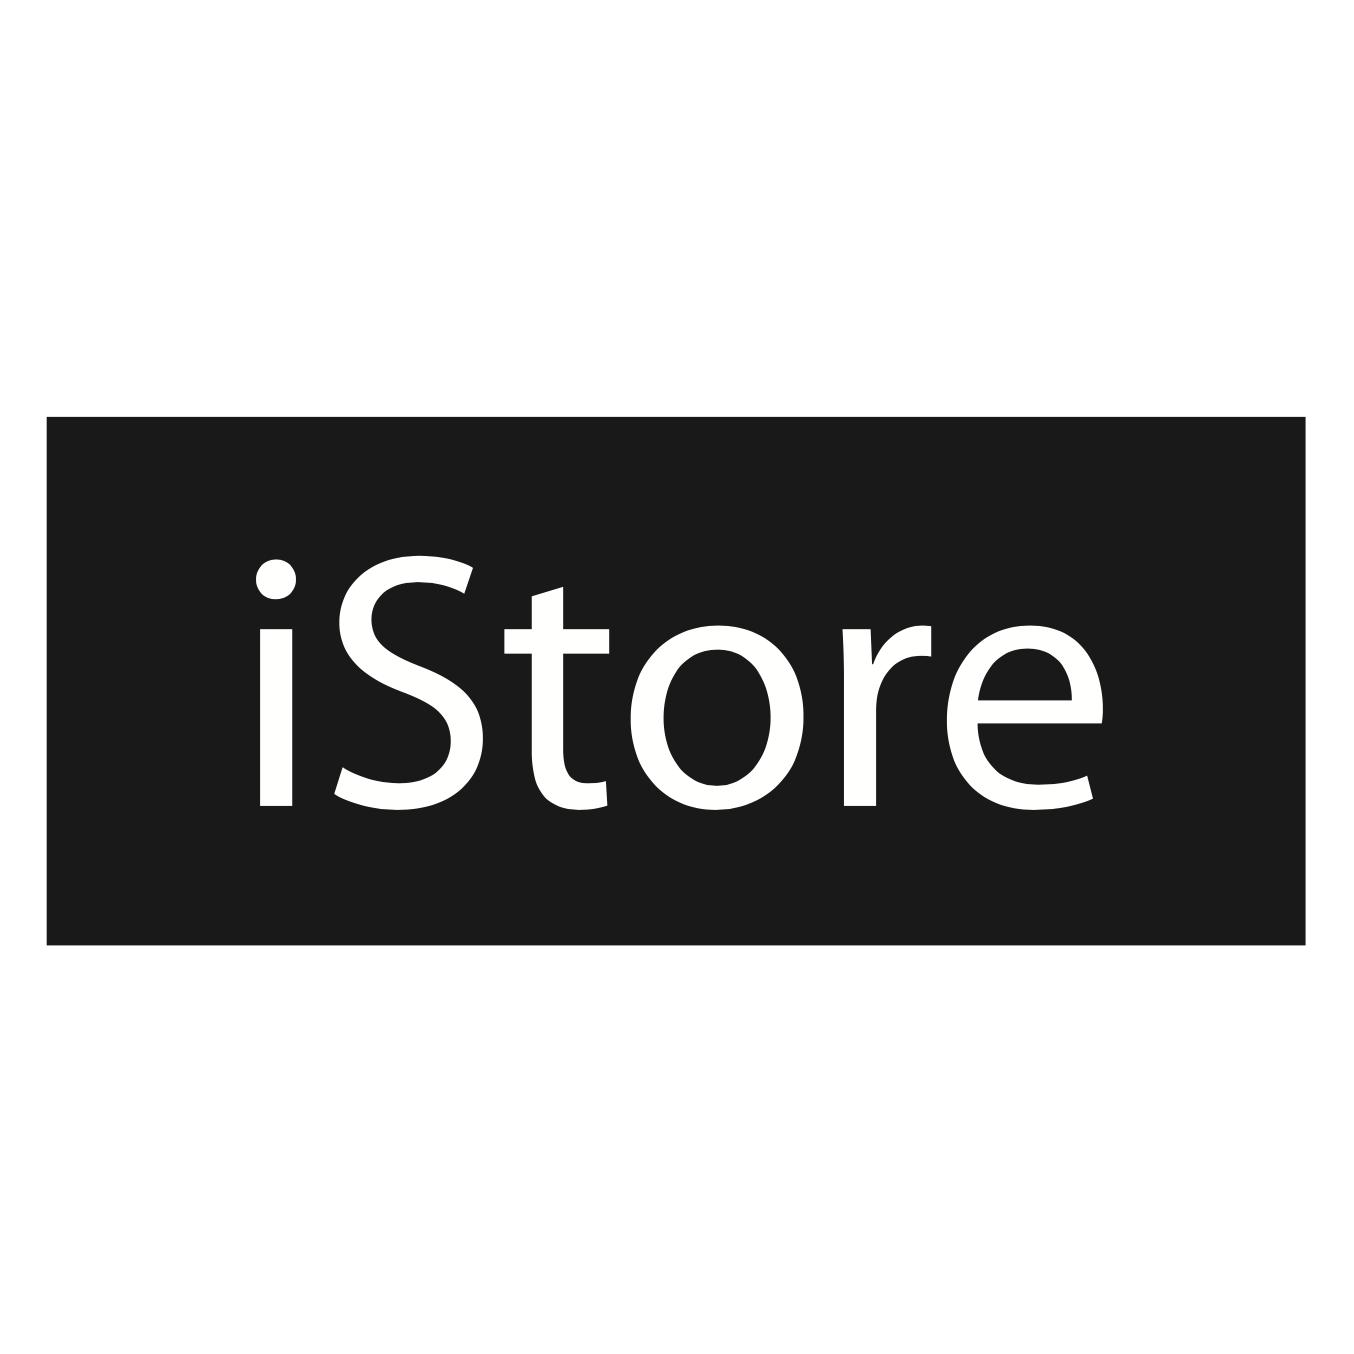 iPhone 6 64GB - Space Grey